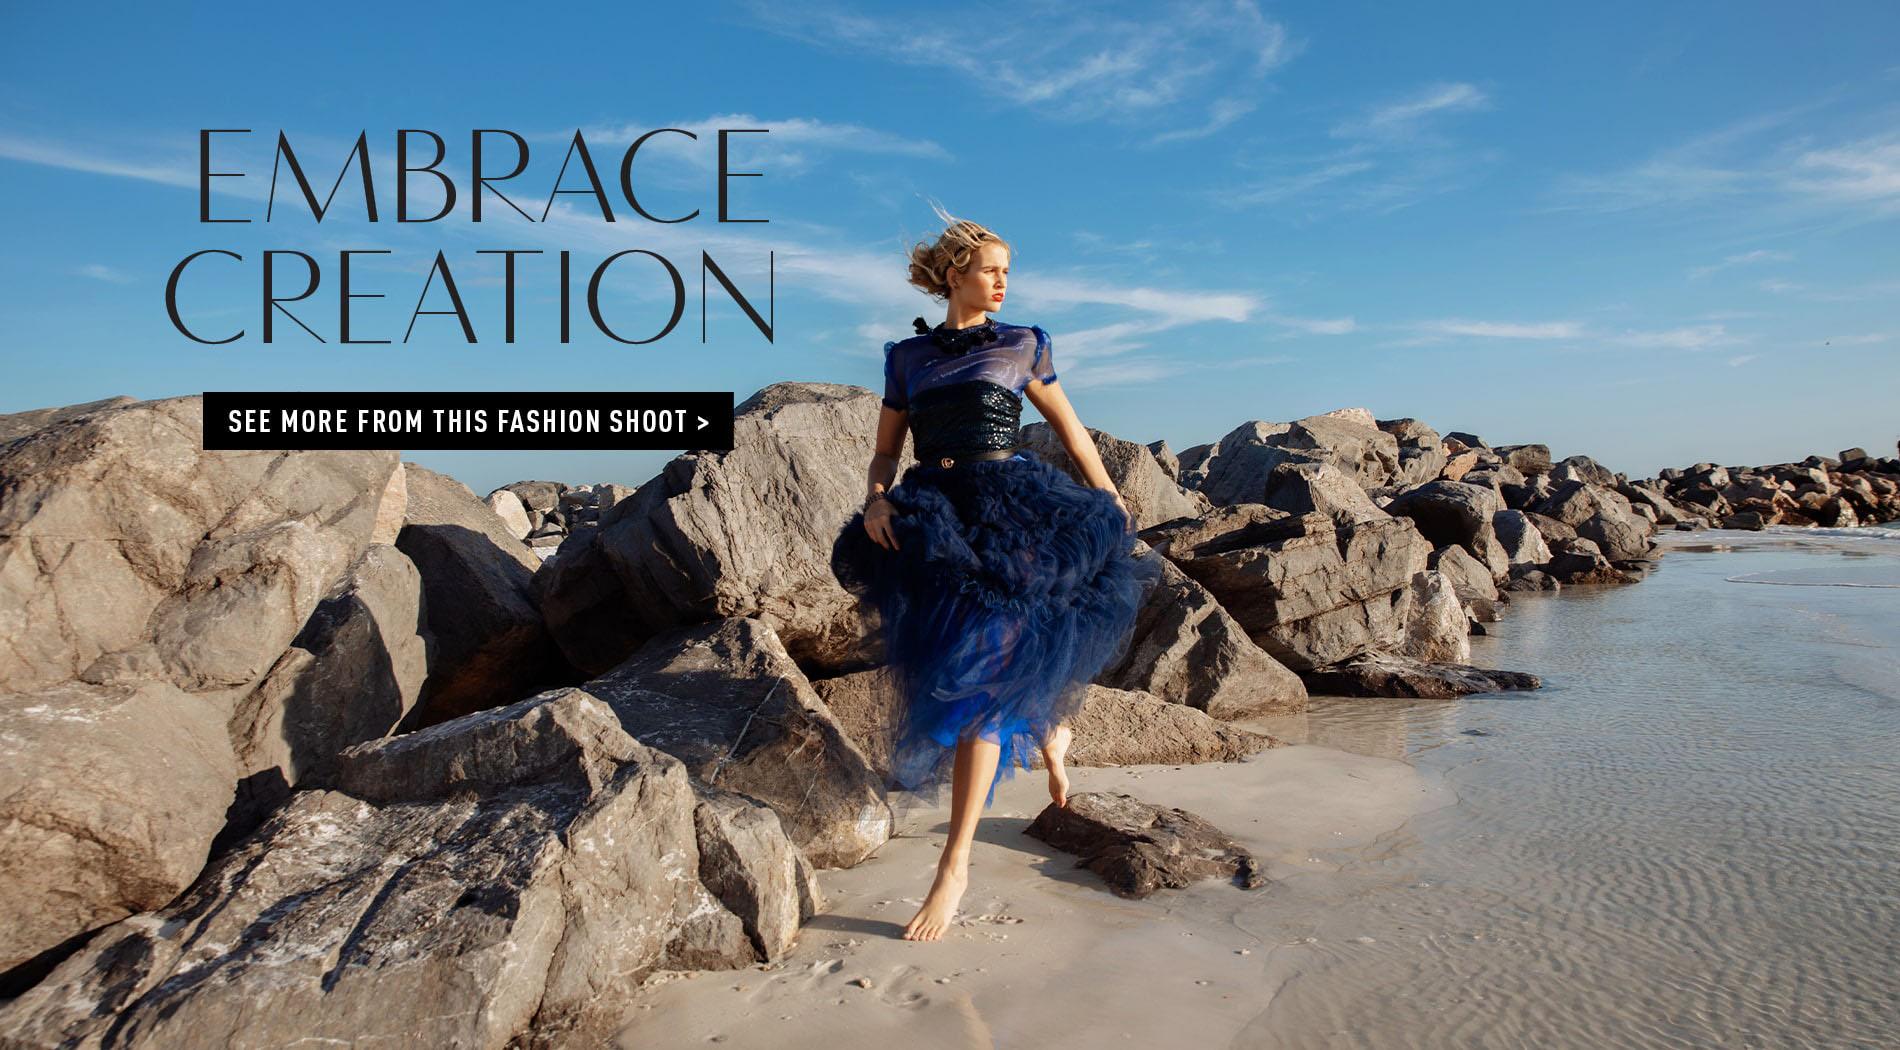 VIE Magazine, Lauren Athalia, Destani Hoffman, DH Designs, The Southern Atelier, Stacy Alderson, ONYX Model Management, Private Gallery